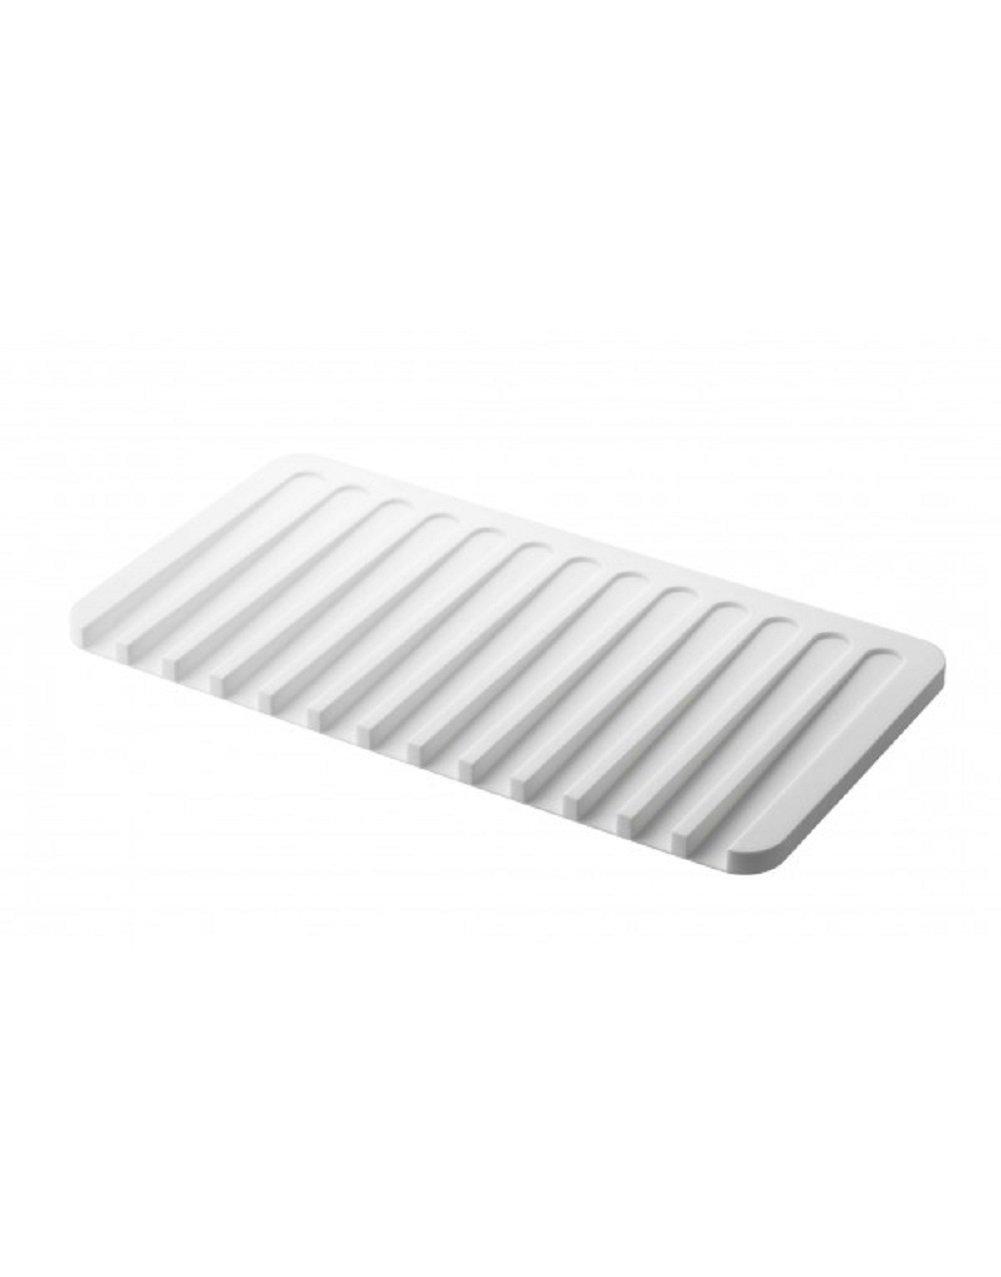 YAMAZAKI home 7395 Flow Soap Tray-Silicone Holder Dish for Sink, White by YAMAZAKI home